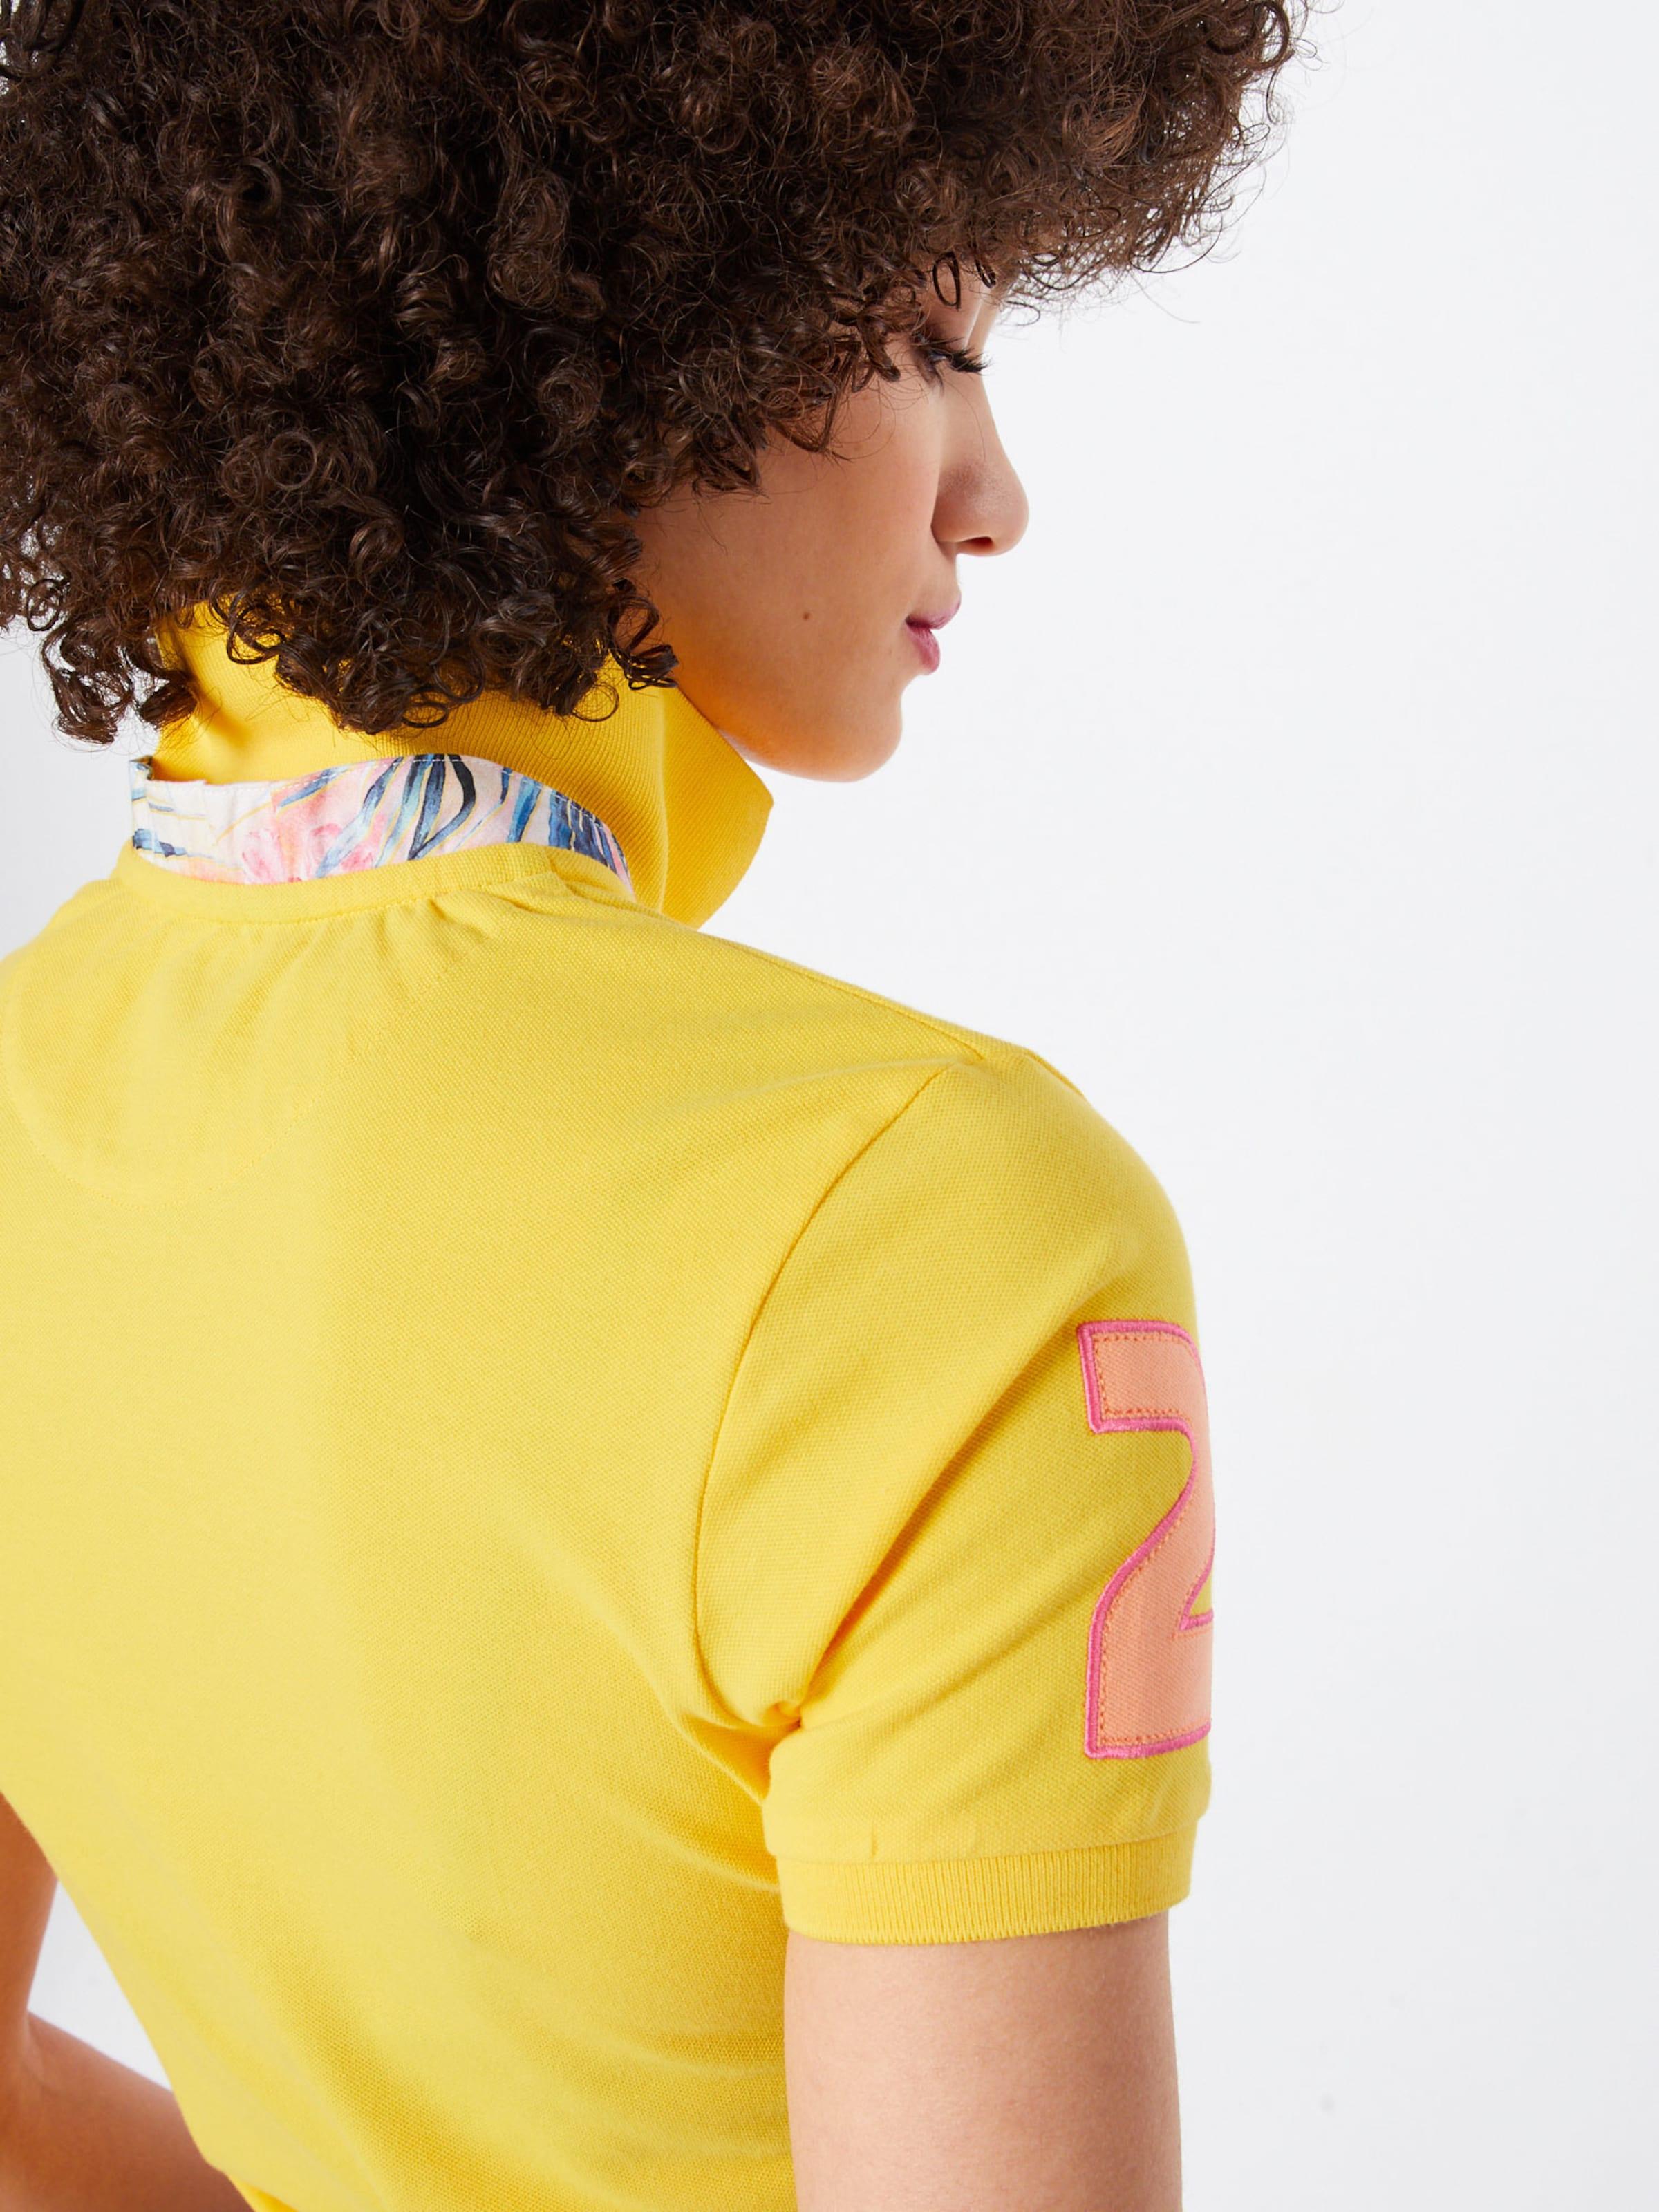 shirt En Martina Piquet Stretch' Jaune La T 'woman Polo bgyvYf76